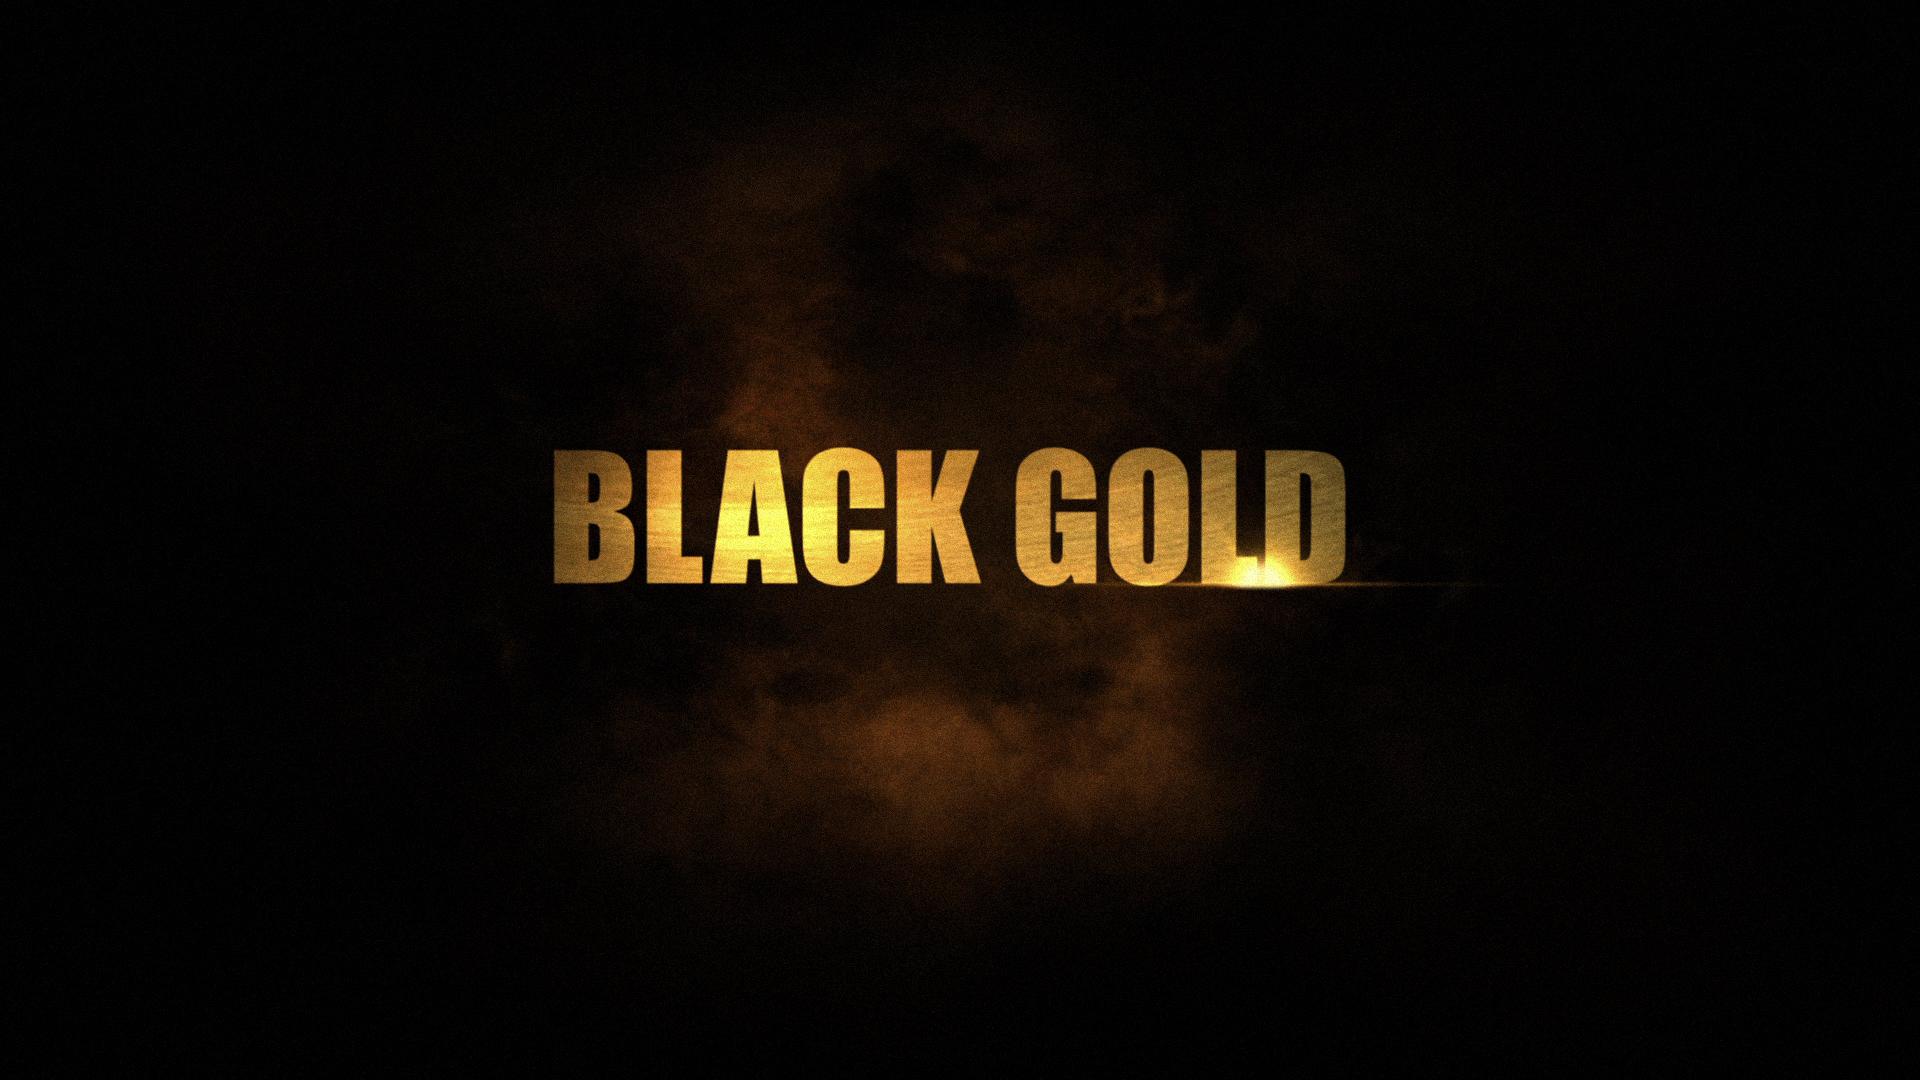 Black Gold wallpaper   459127 1920x1080